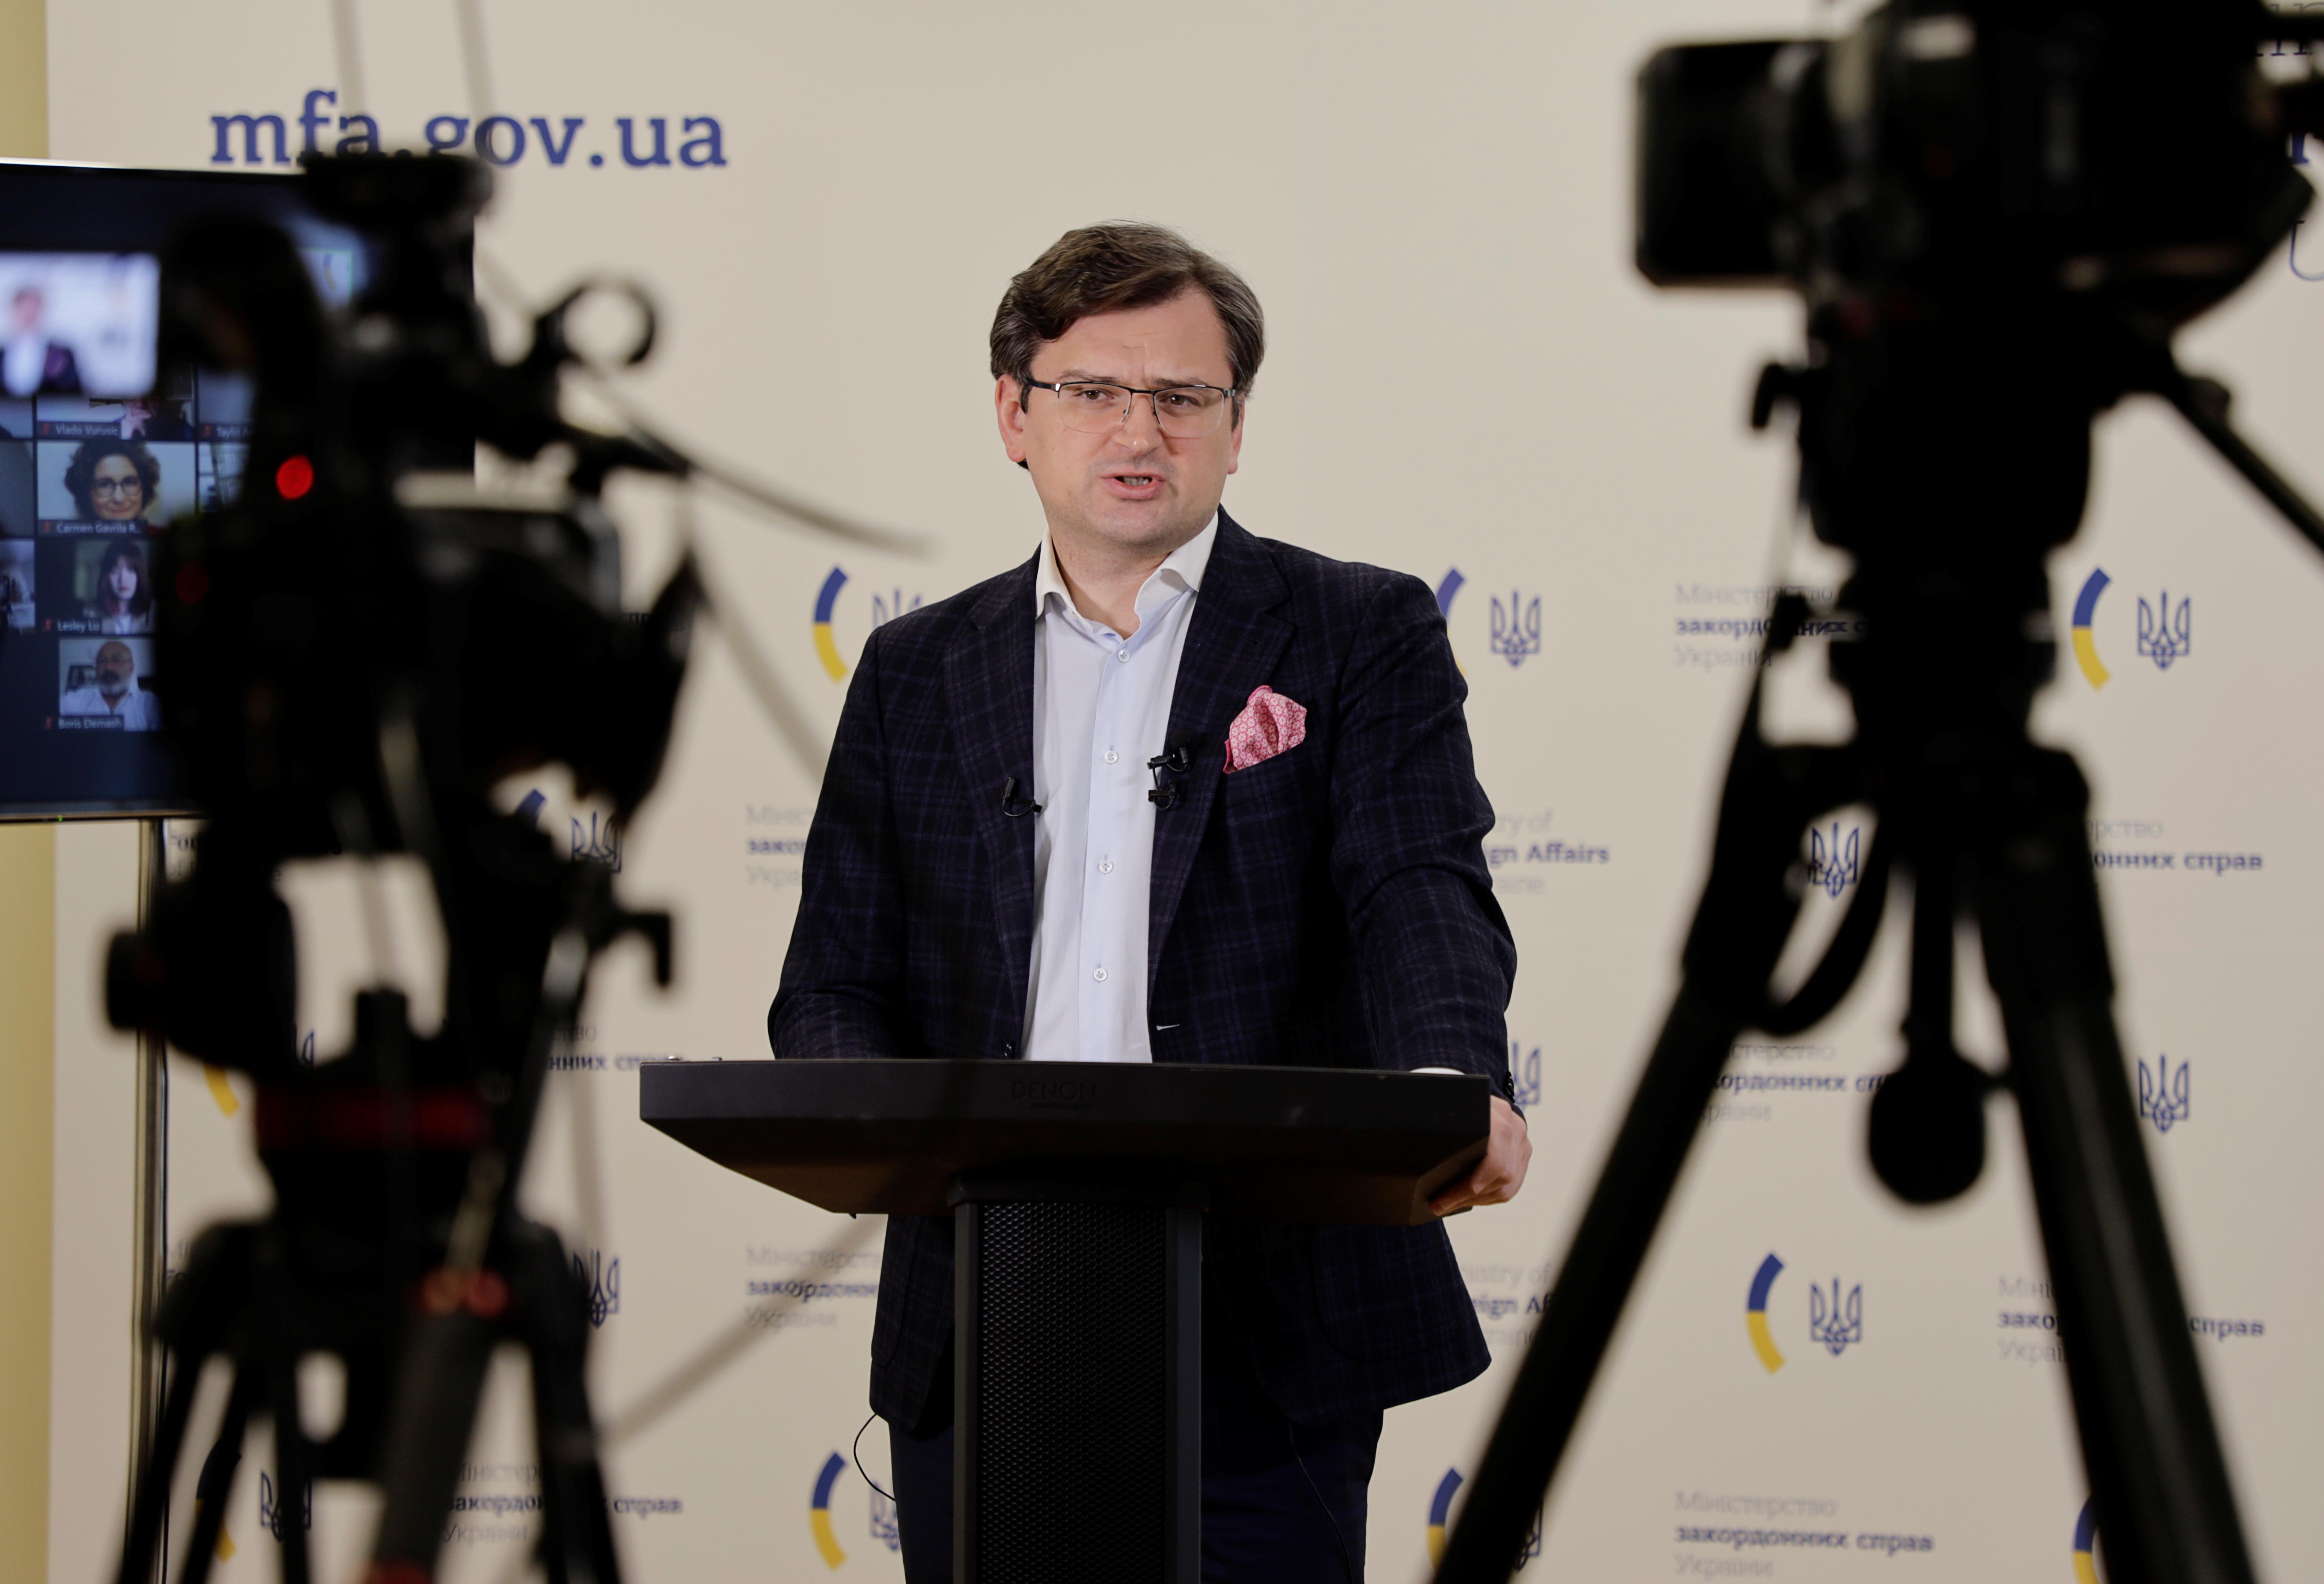 Ukrainian Foreign Minister Dmytro Kuleba speaks during a news conference in Kyiv, Ukraine April 20, 2021. REUTERS/Sergei Karazy